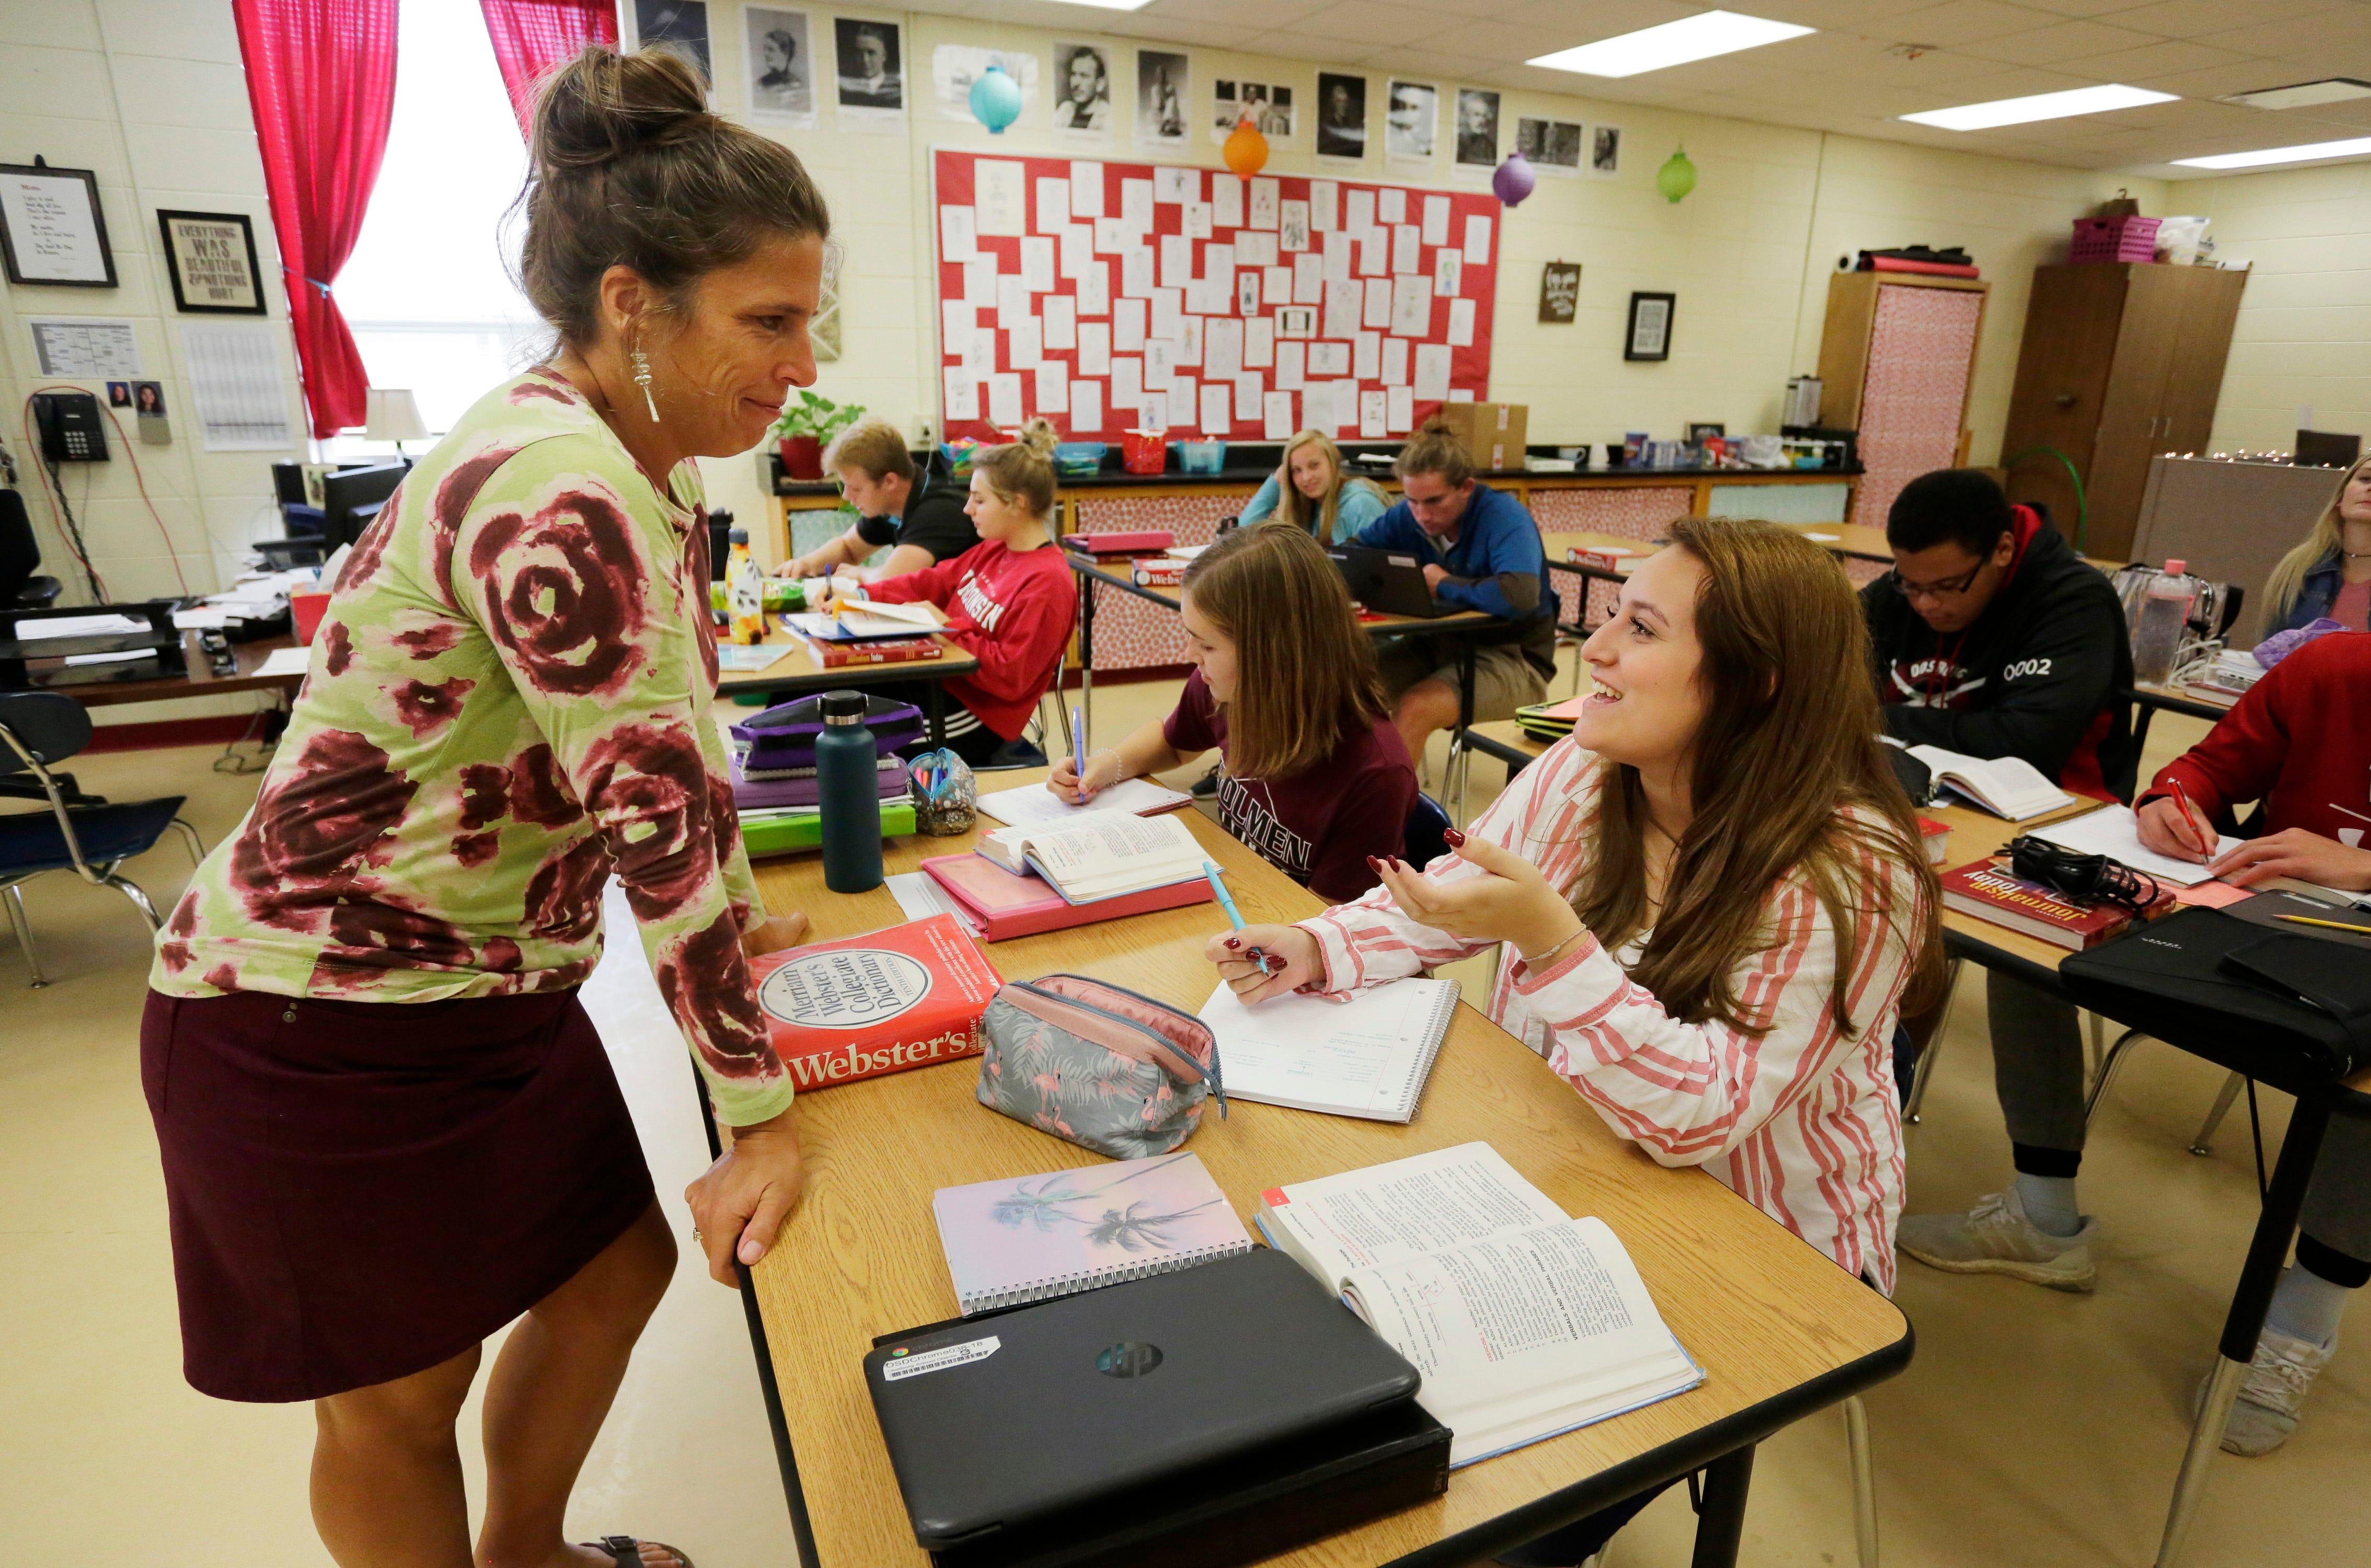 Oostburg High School English teacher Tamala Szyman, left, smiles as she listens to student Angela Trekas, right, during a class Wednesday, Sept. 25, 2019, in Oostburg.